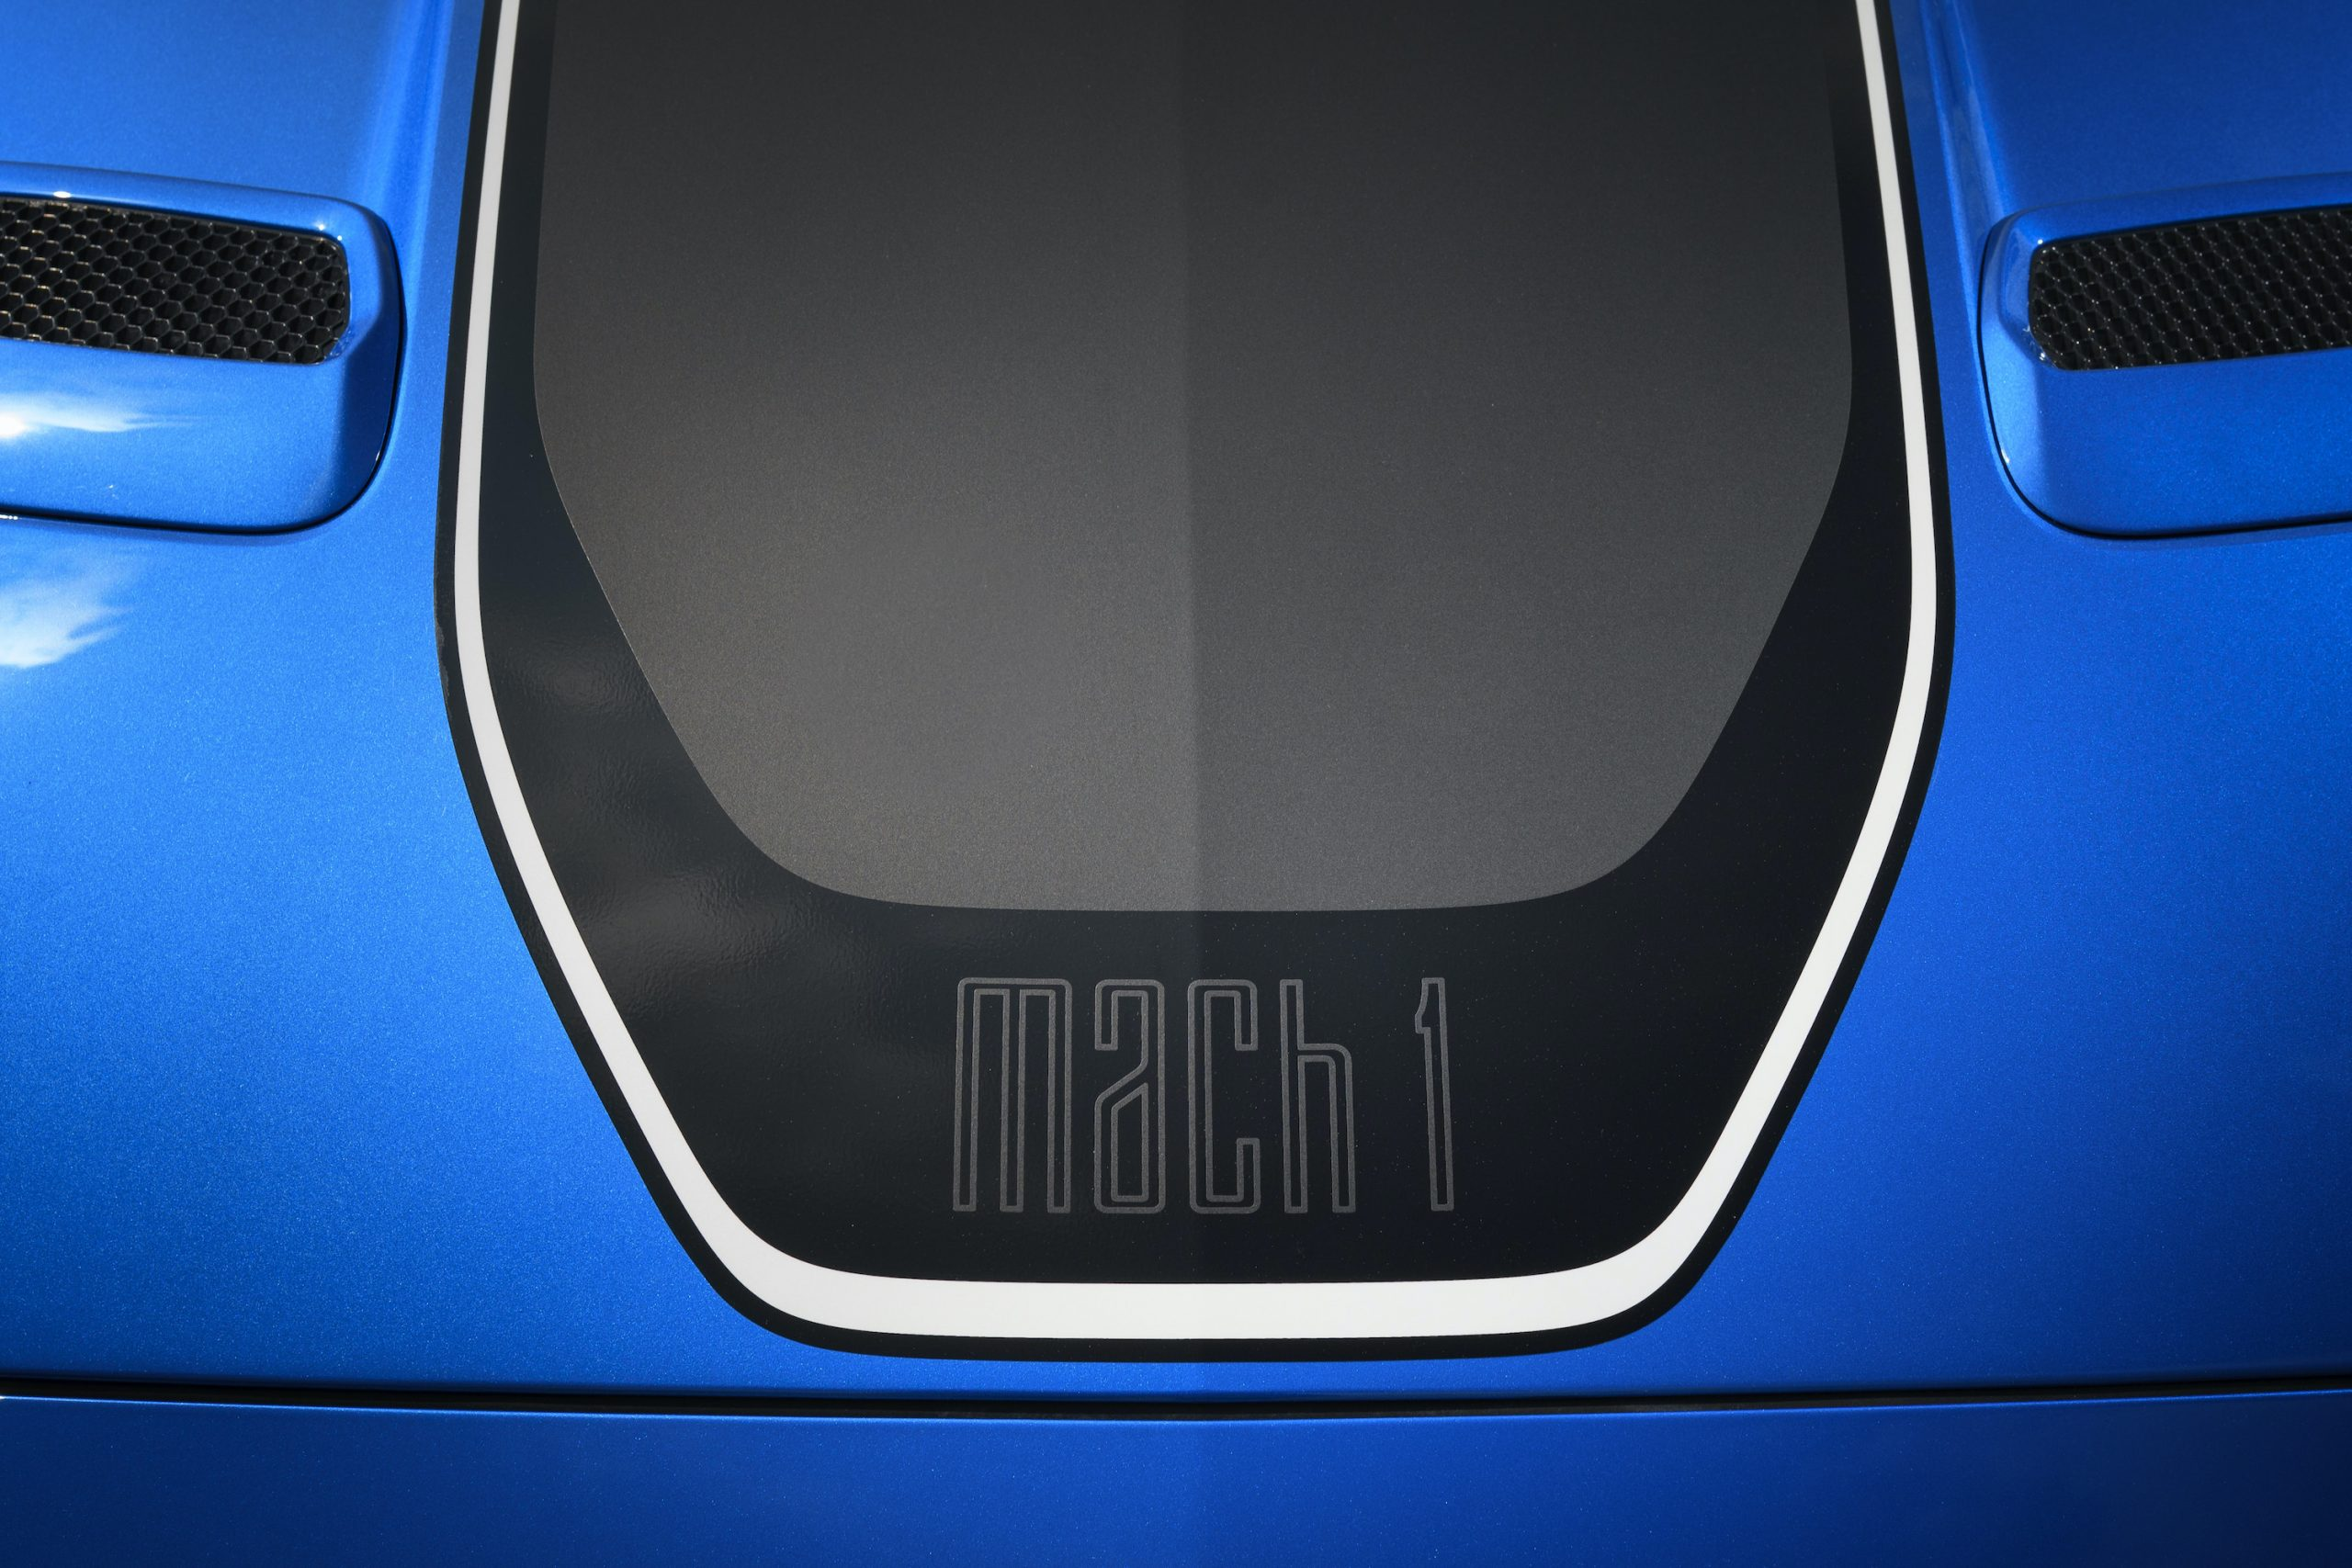 2021 Ford Mustang Mach 1 emblem detail